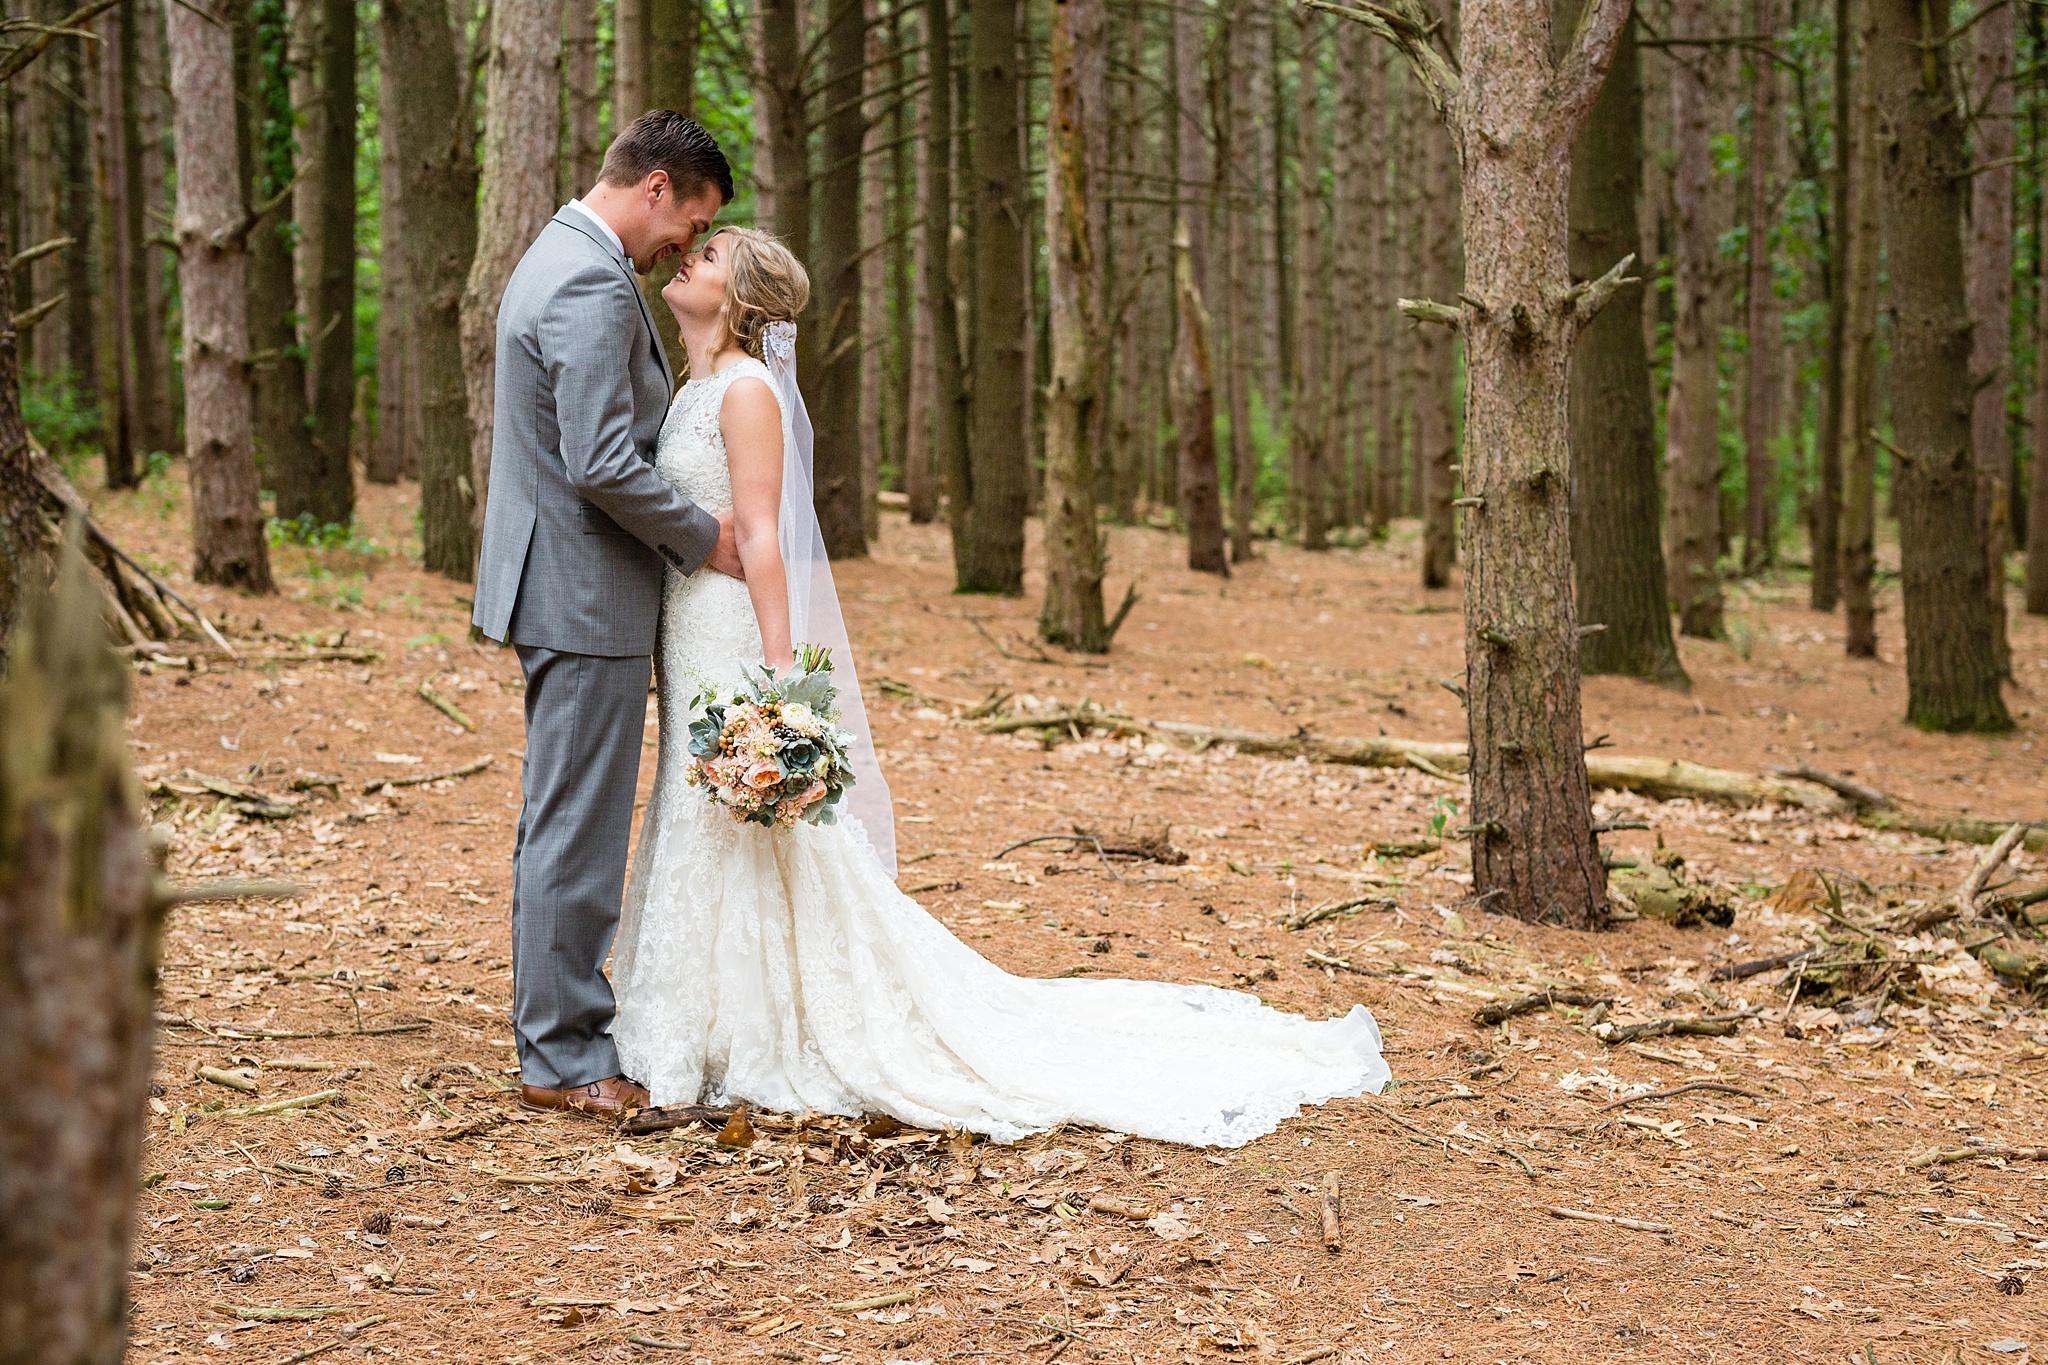 Mandi_Jack_Treehouse_Grand_Rapids_Wedding_0025.jpg